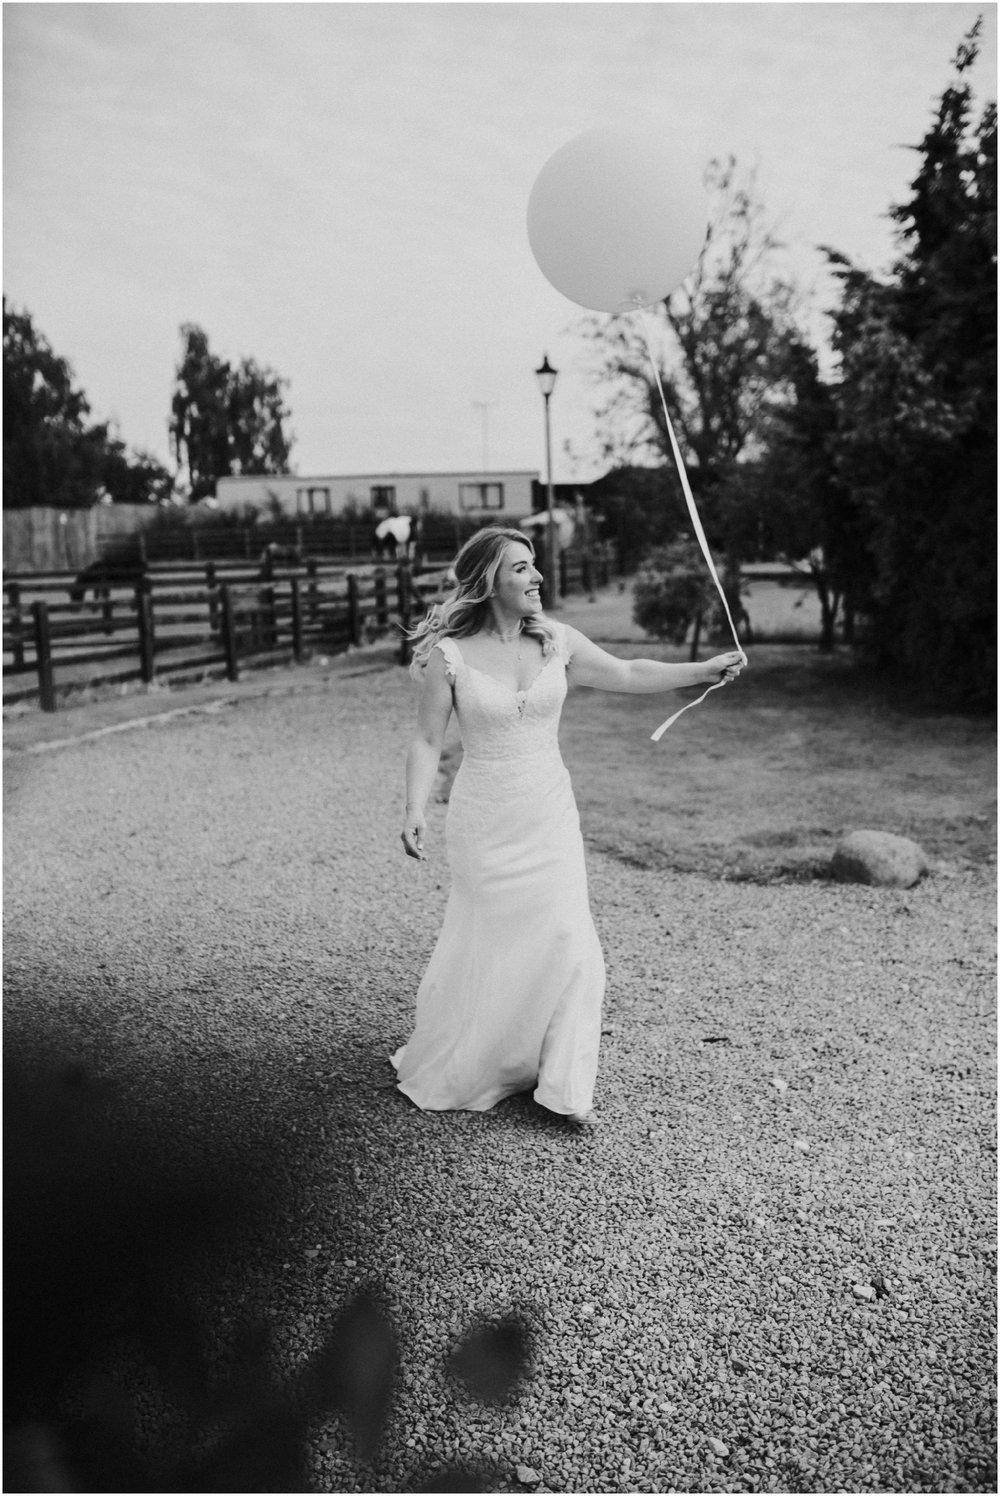 SkipbridegFarmWedding-LukeHolroyd-Yorkshirewedding_0113.jpg